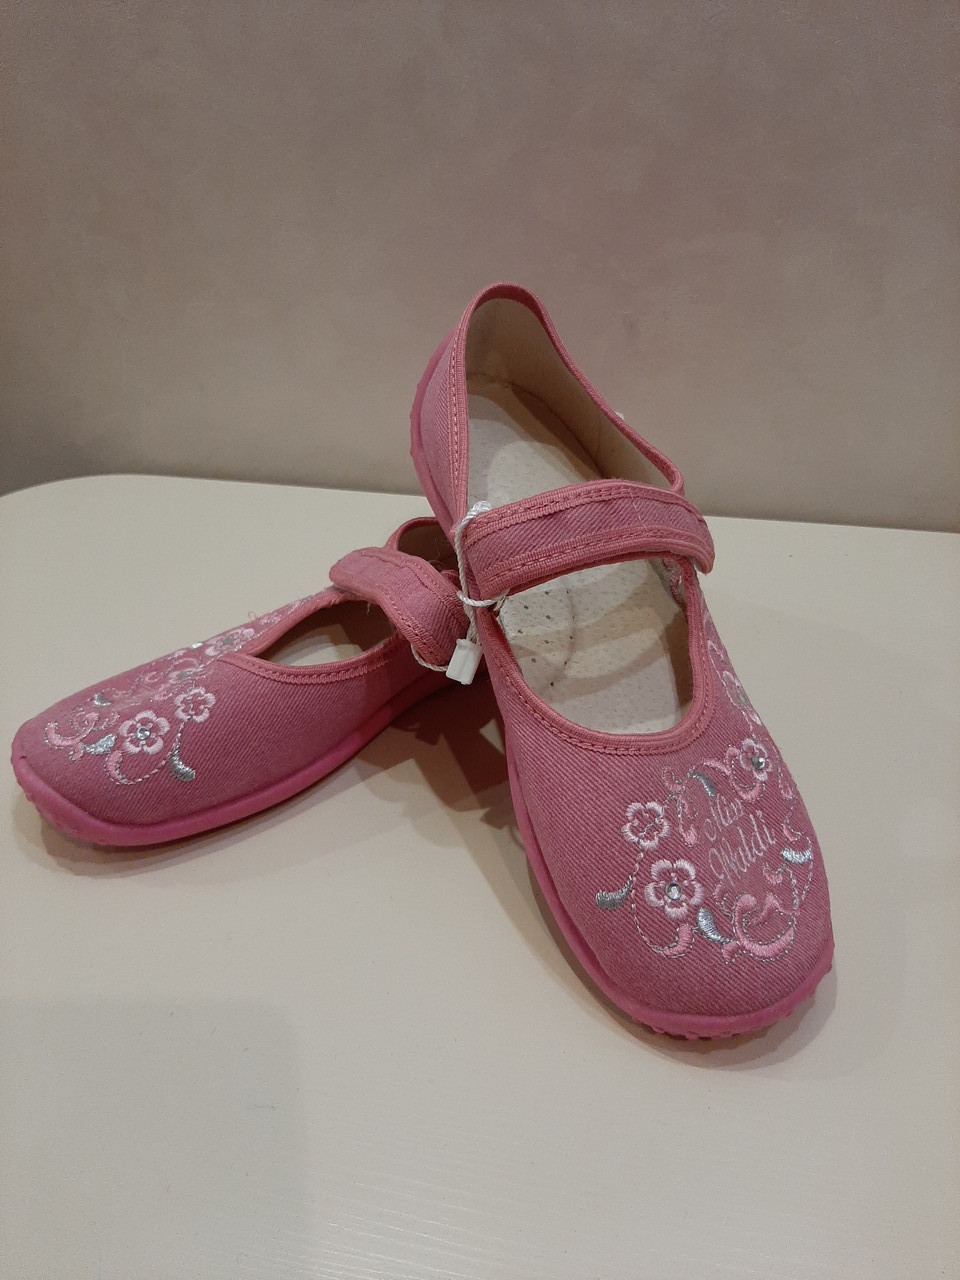 Тапочки детские для девочки розовые р.34 ТМ Waldi